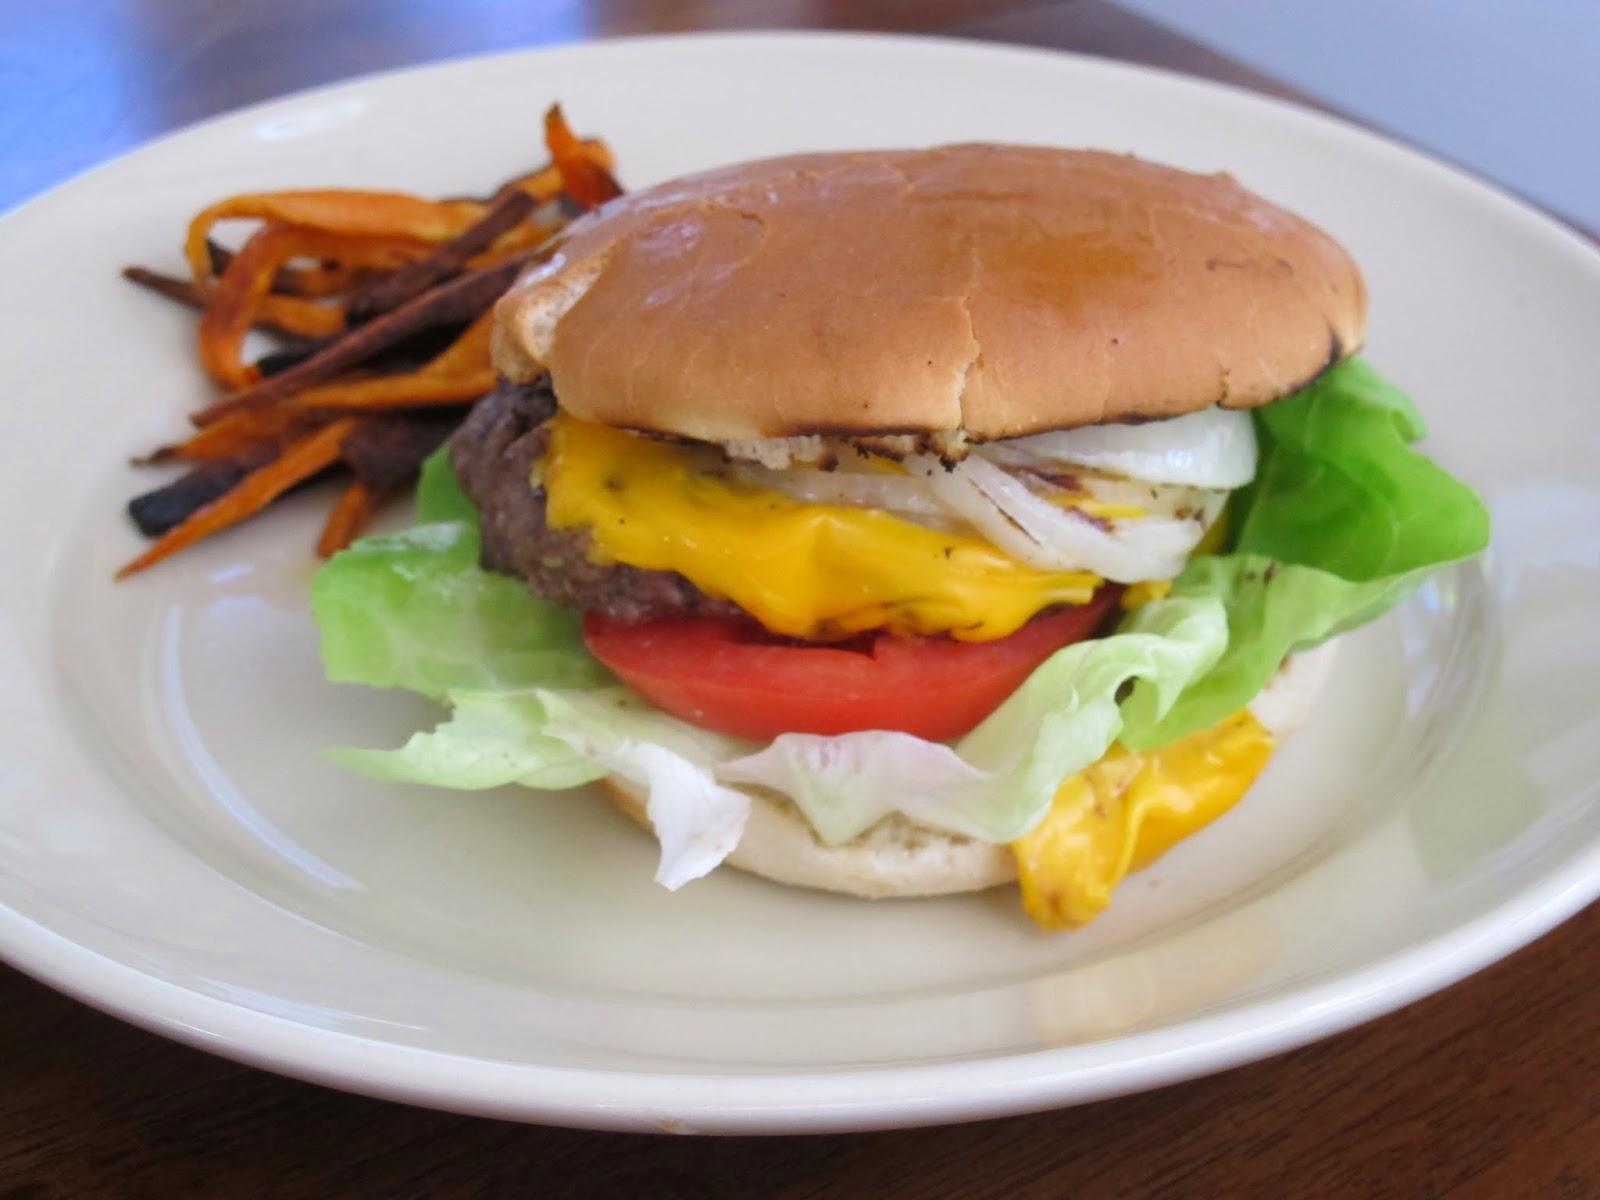 Classic American Cheeseburgers